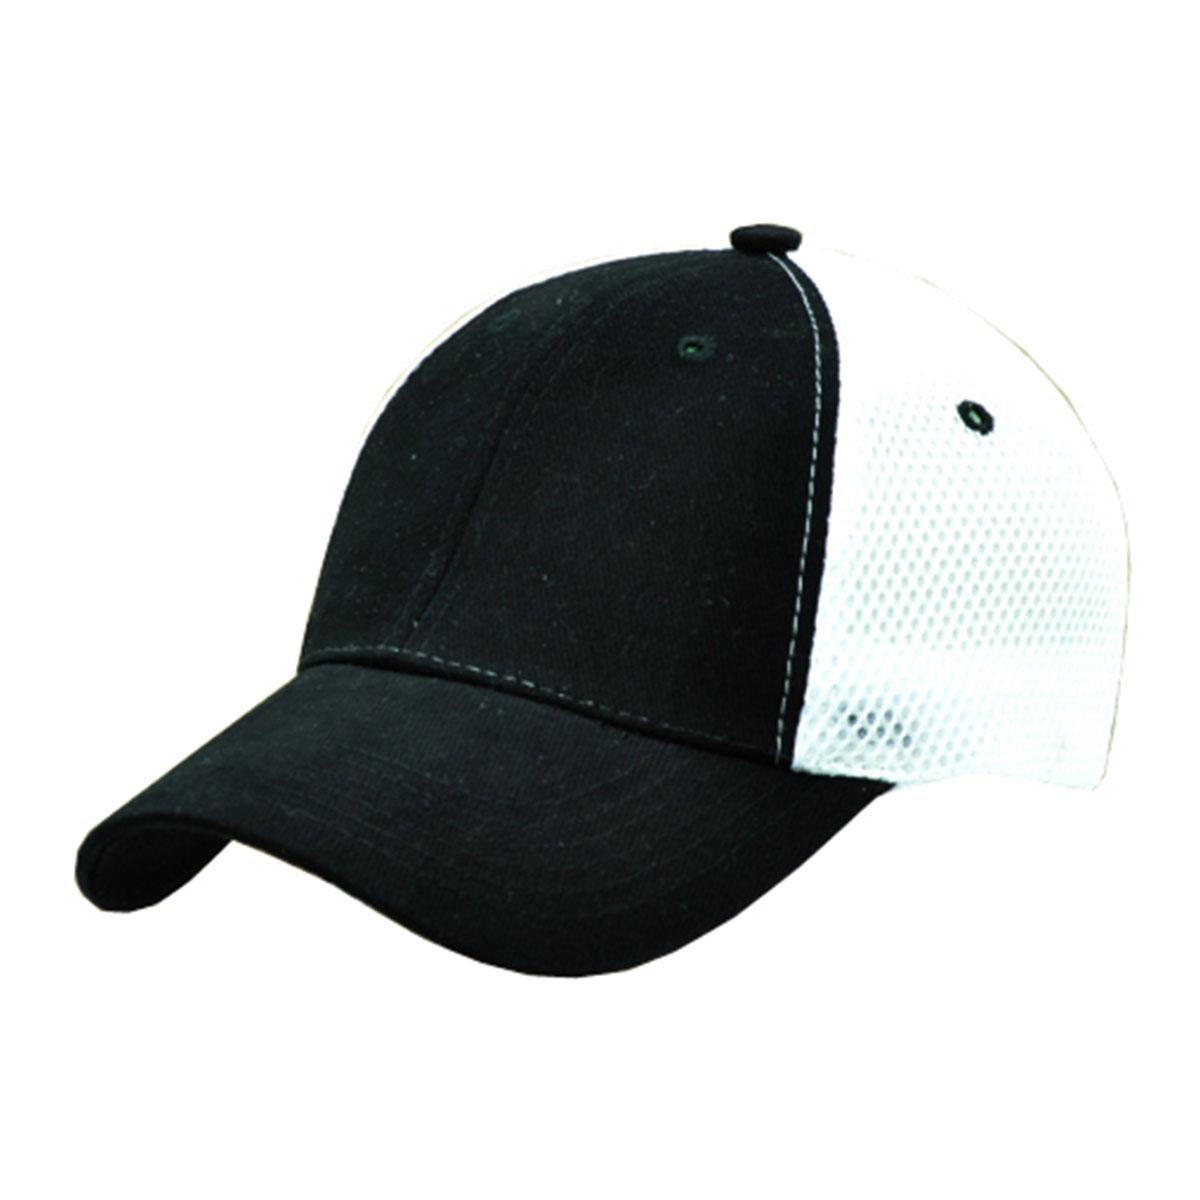 Hohner Cap-Black / White